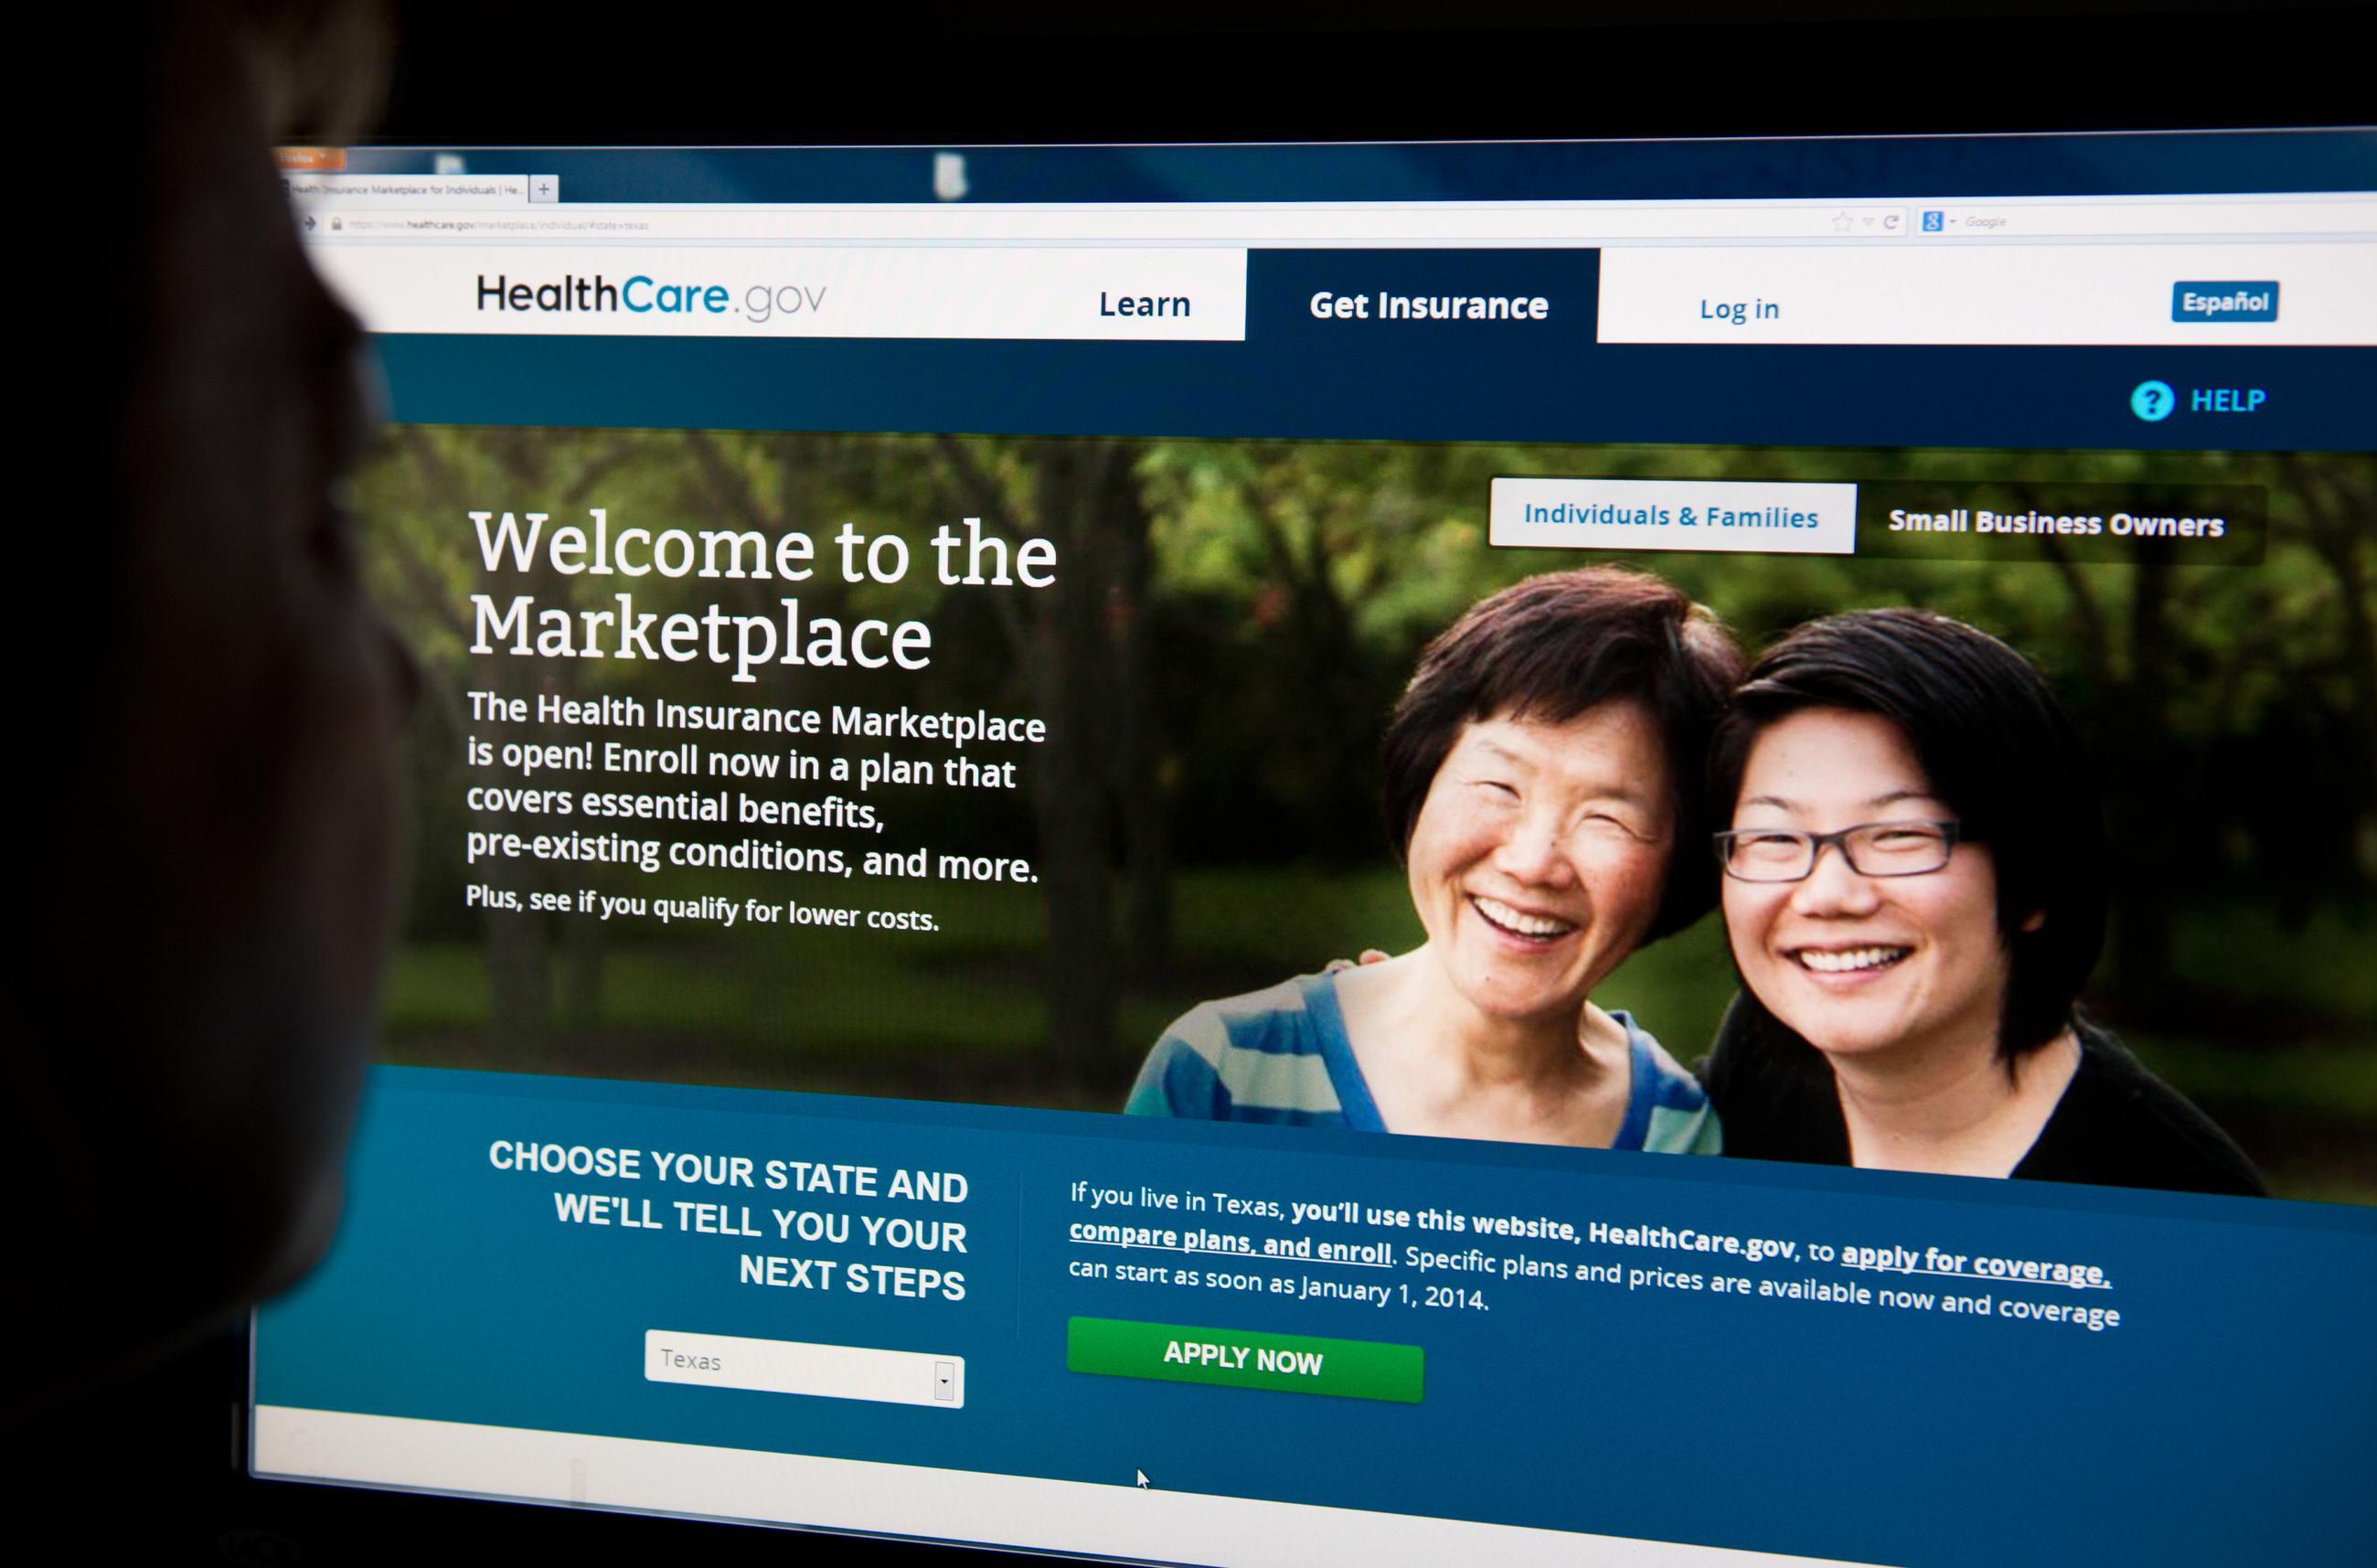 It's Official: Obamacare Enrollment Is Super Low